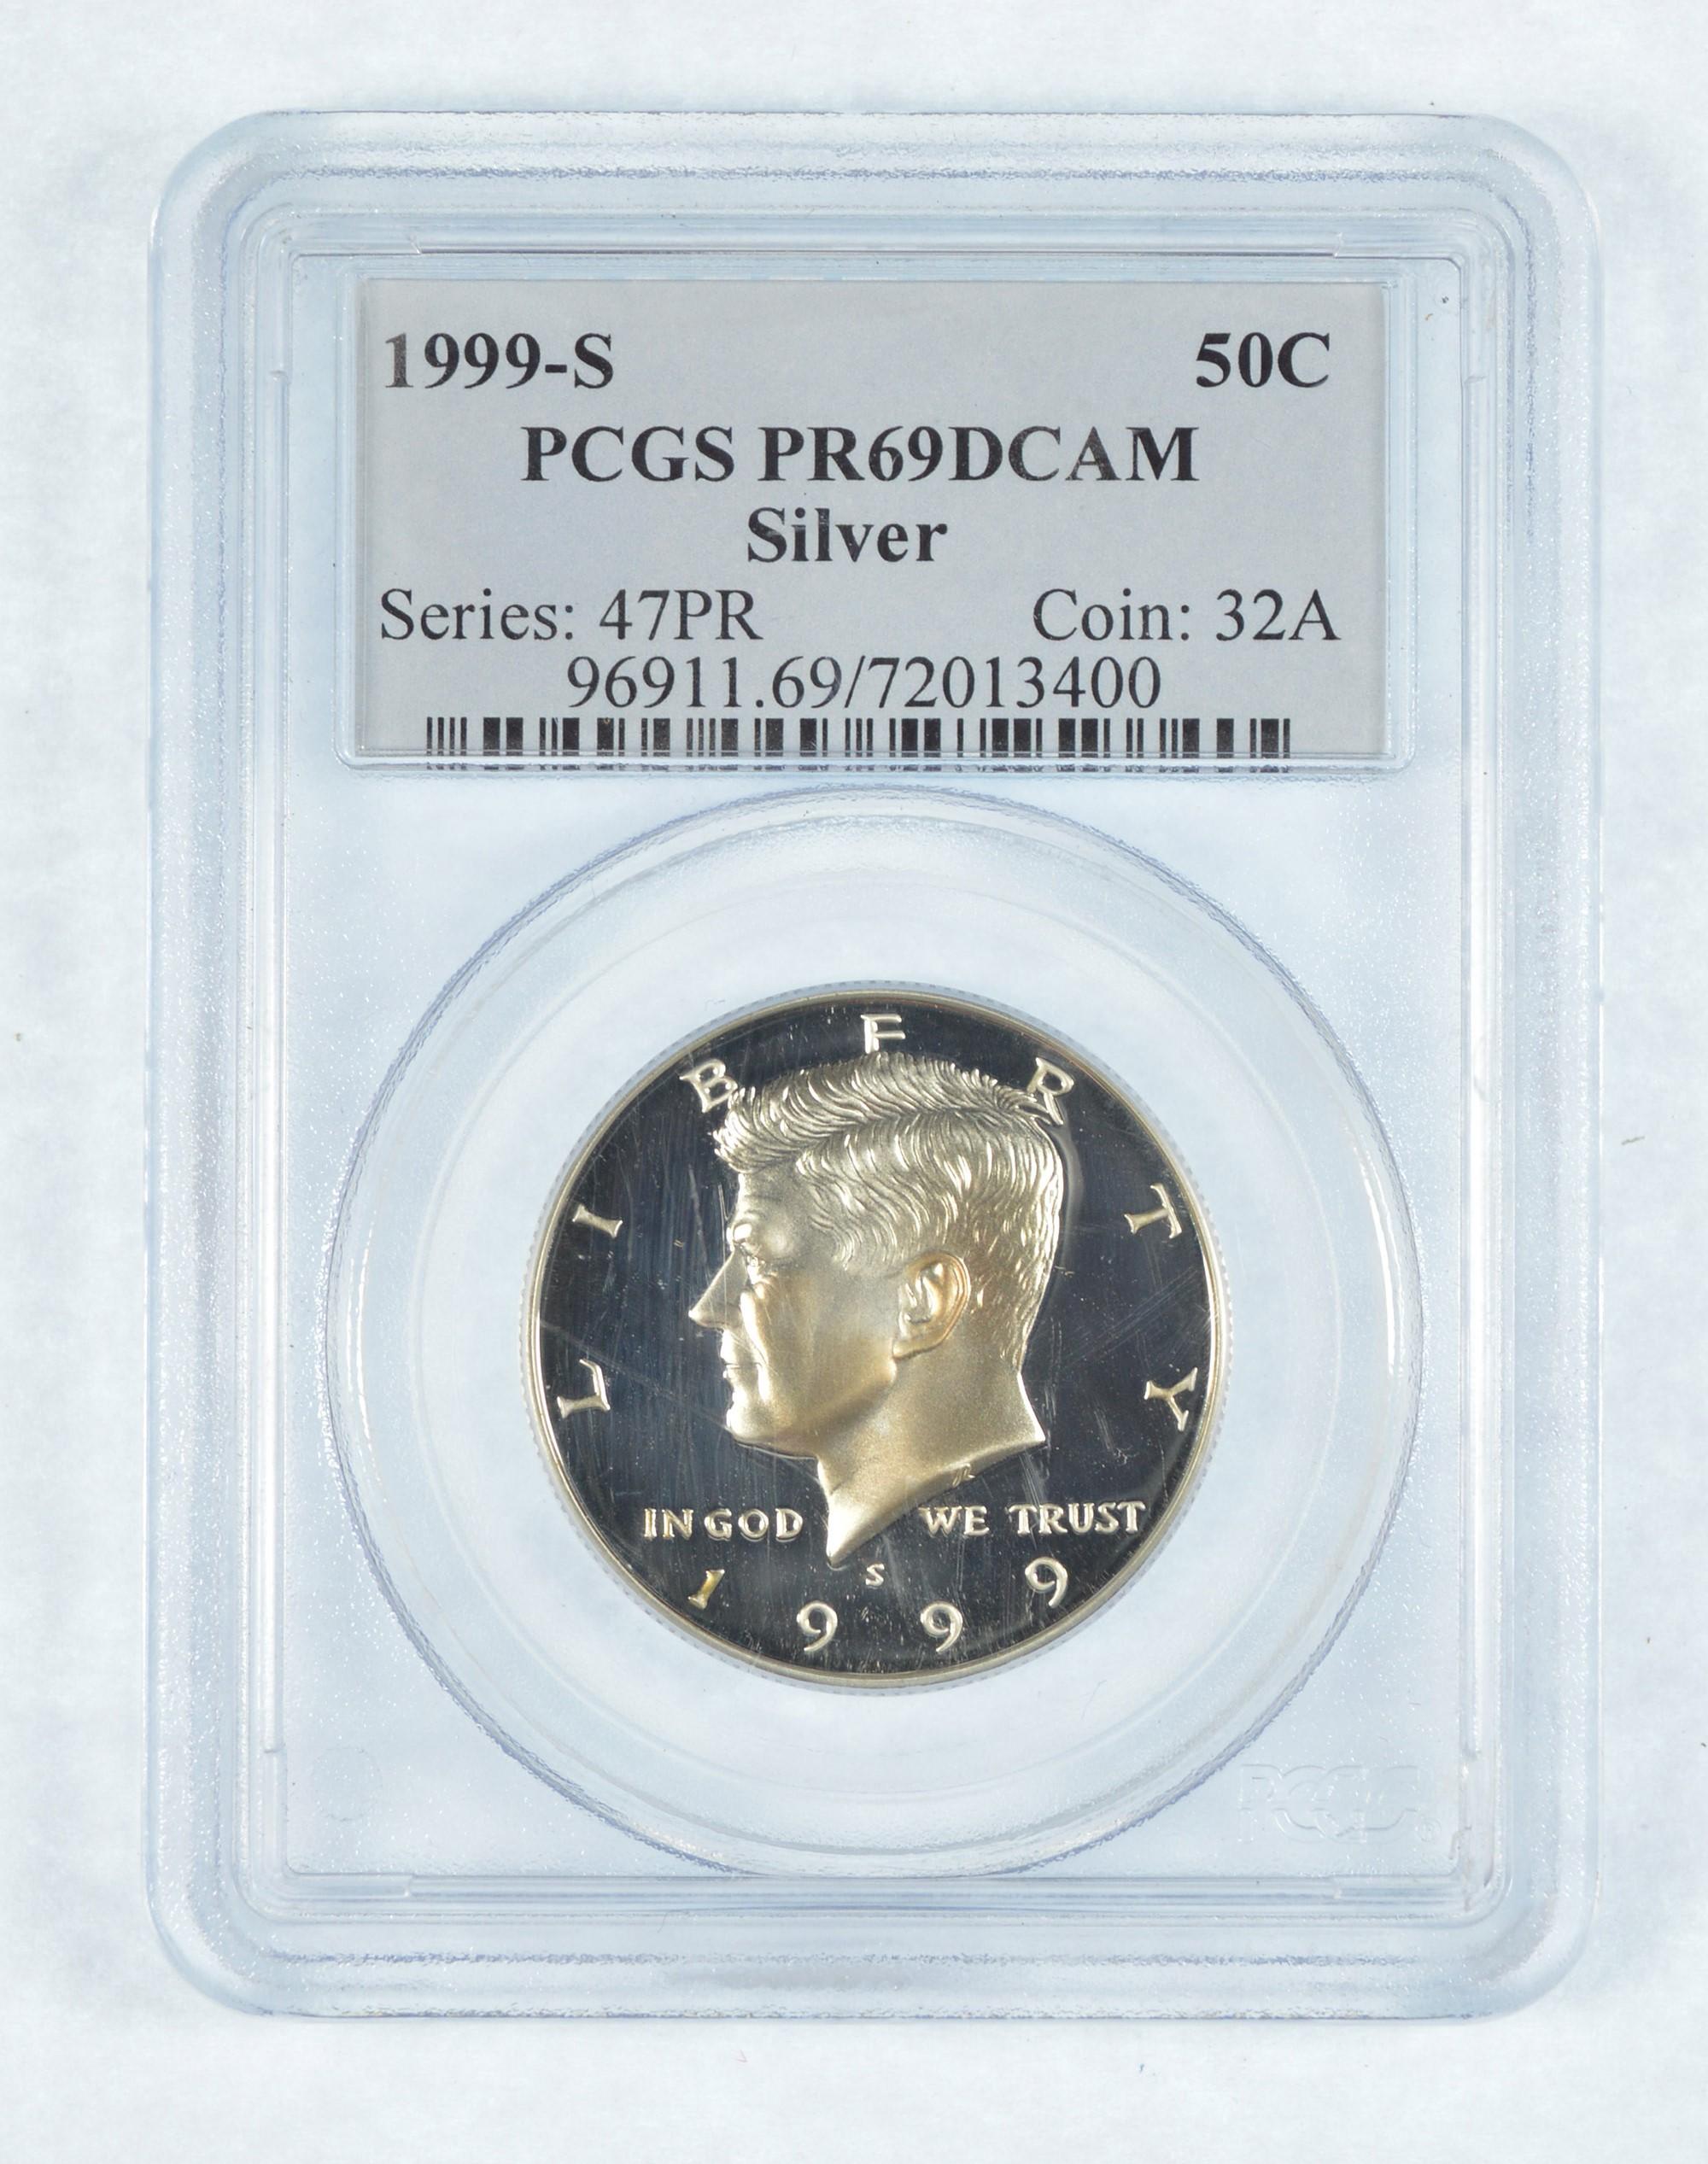 2001-S  Kennedy Half Dollar  PCGS PR69DCAM   free shipping!